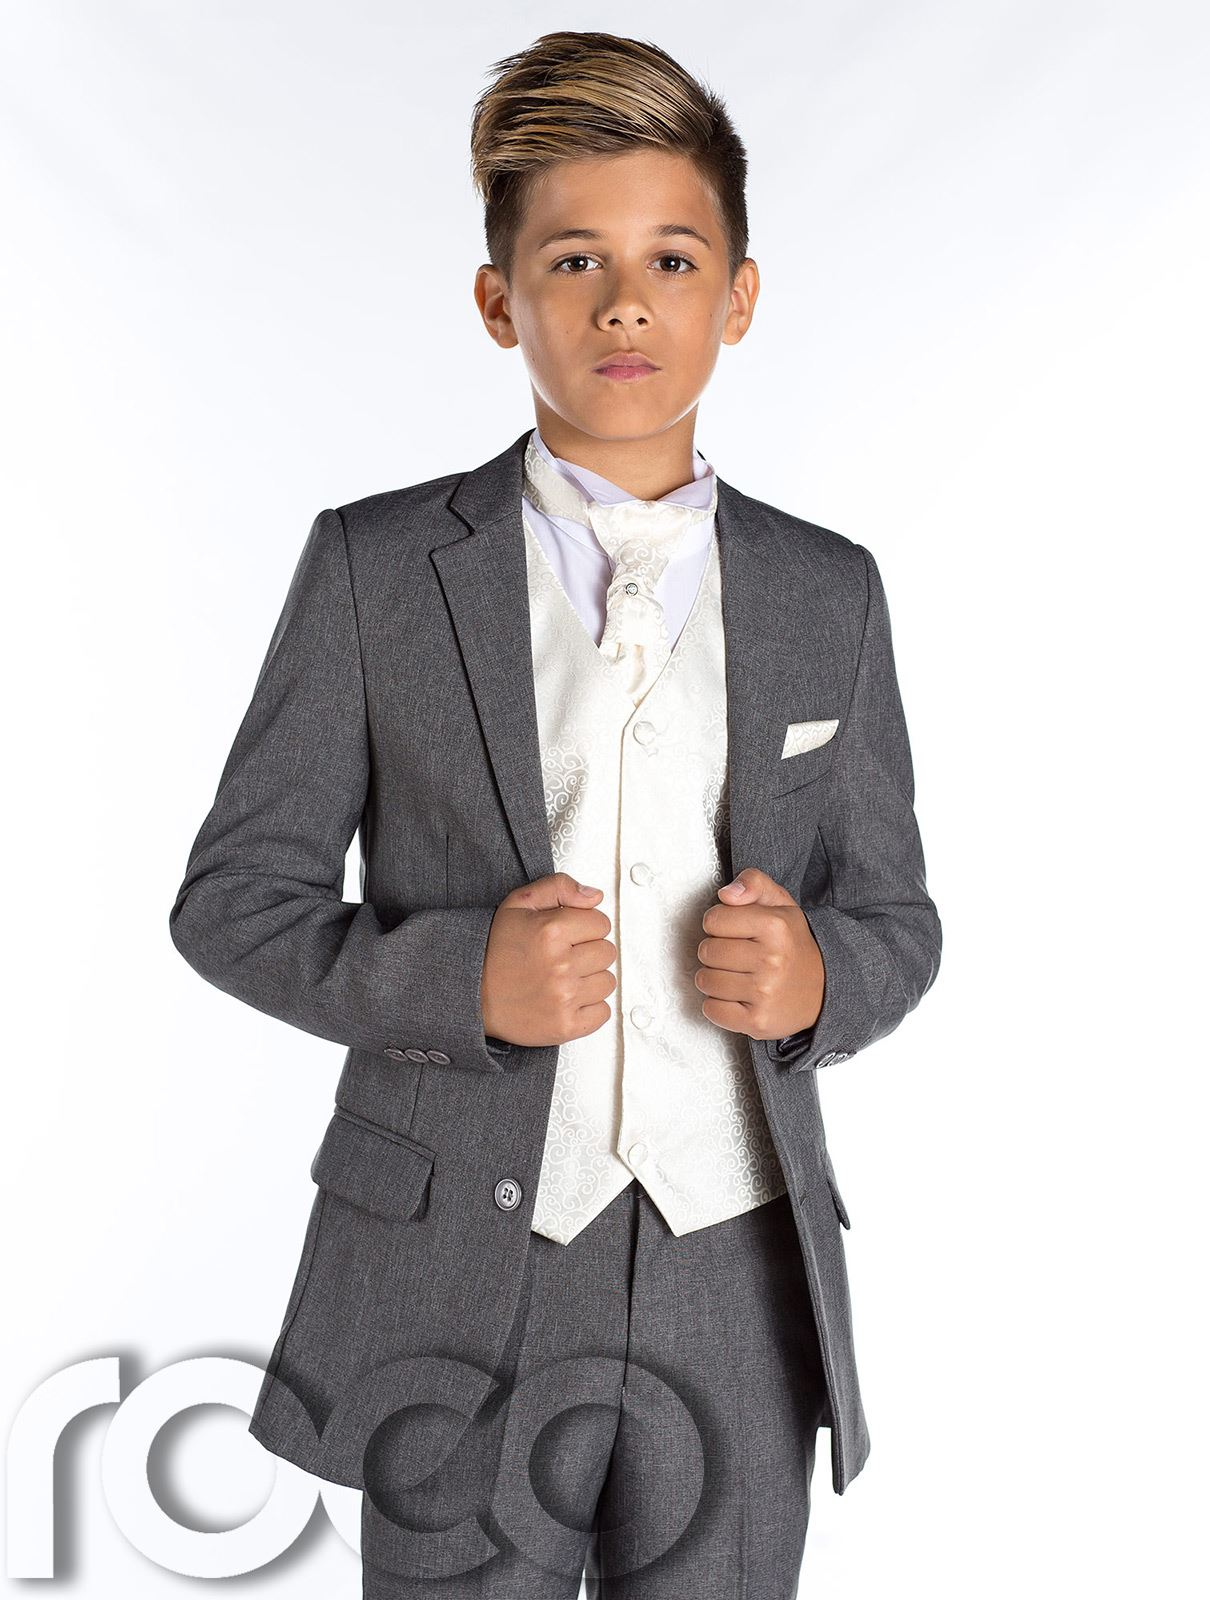 boys wedding suit page boy suit boys grey suit grey slim fit suit rh ebay com boysenstr westerland boysenstr westerland